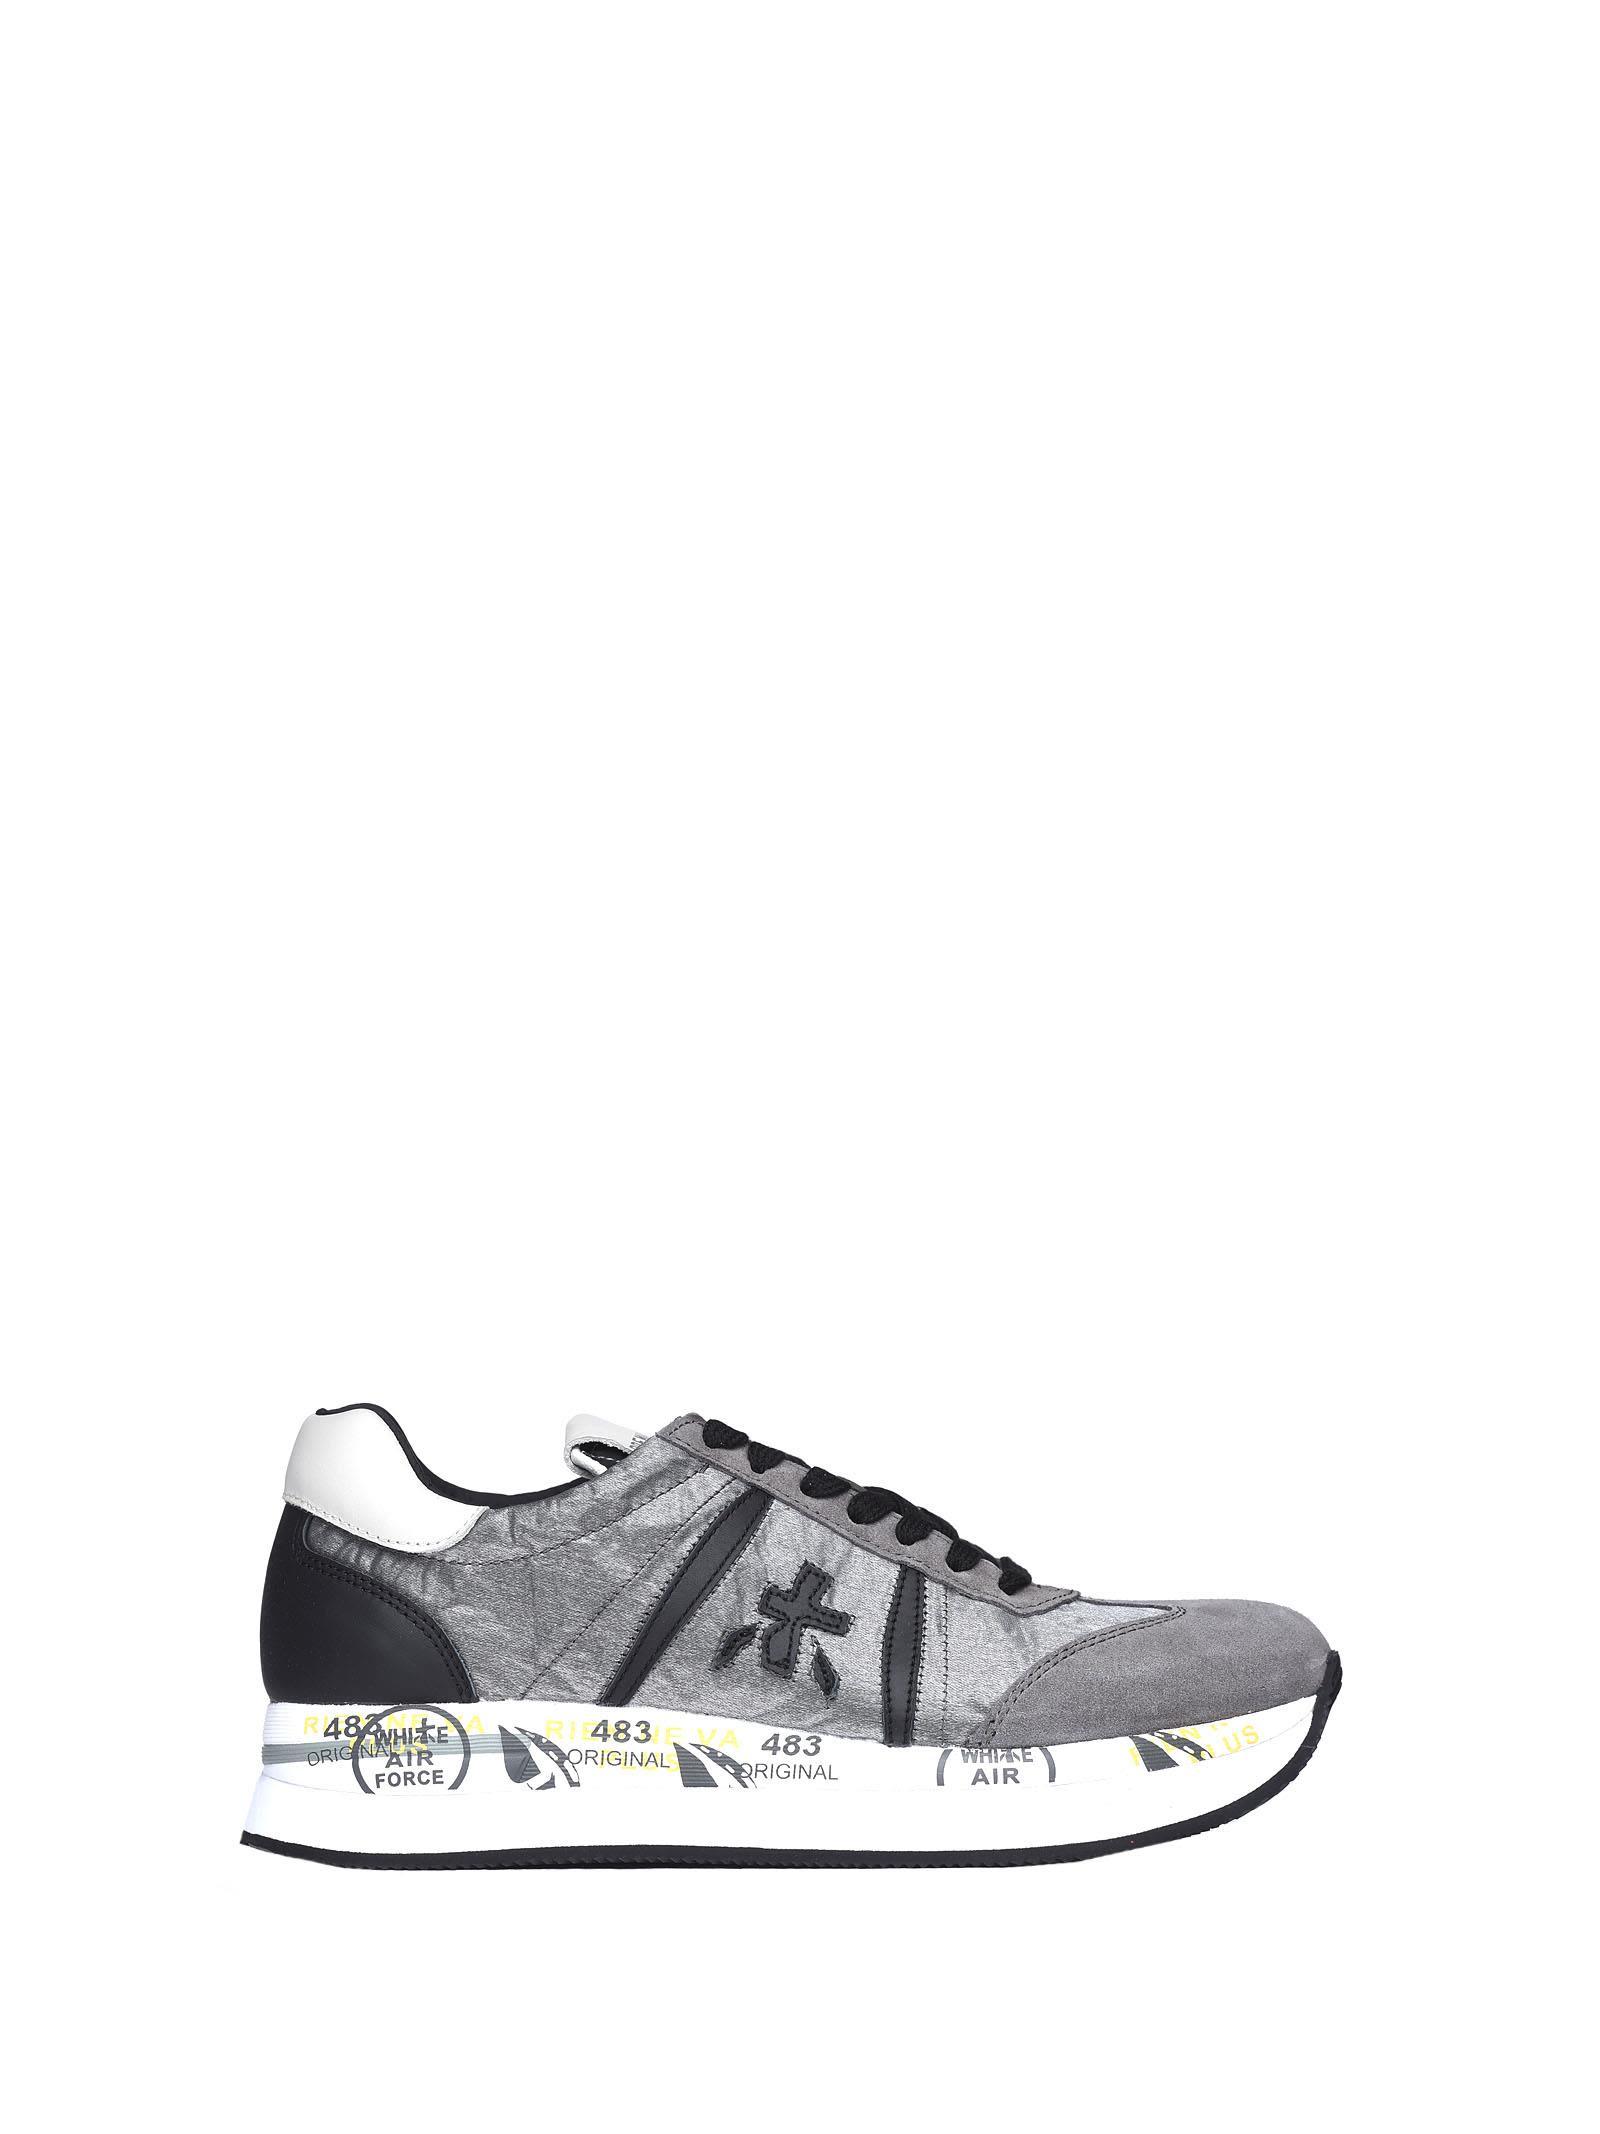 Premiata Conny 1493 Grey Sneakers